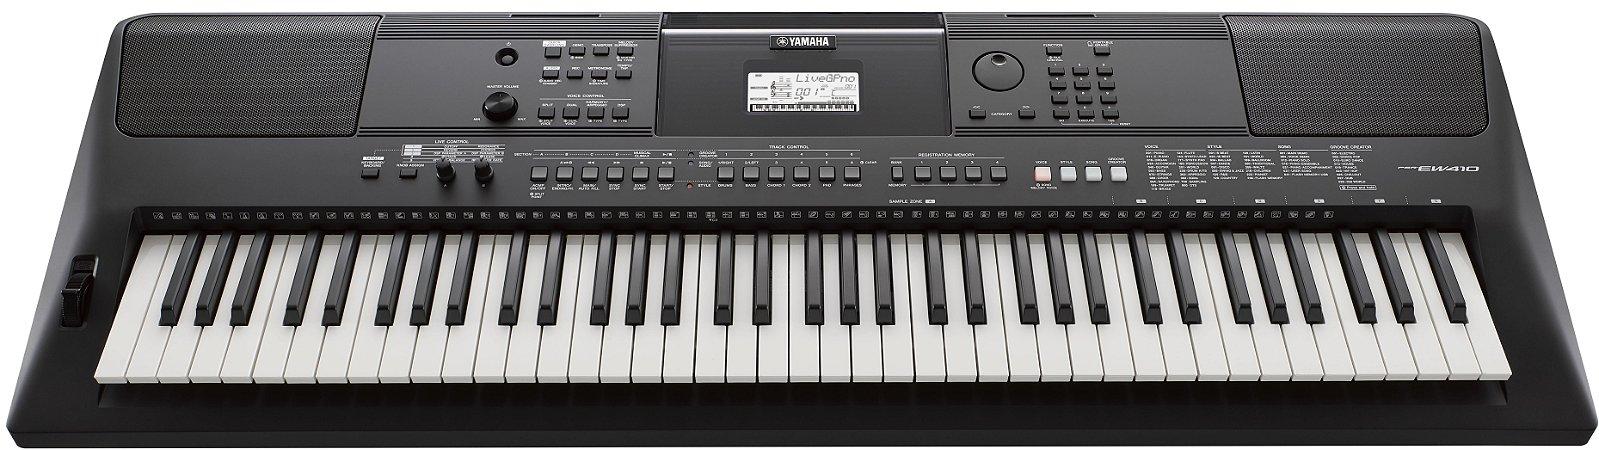 Teclado Arranjador Yamaha PSR EW410 USB 76 Teclas